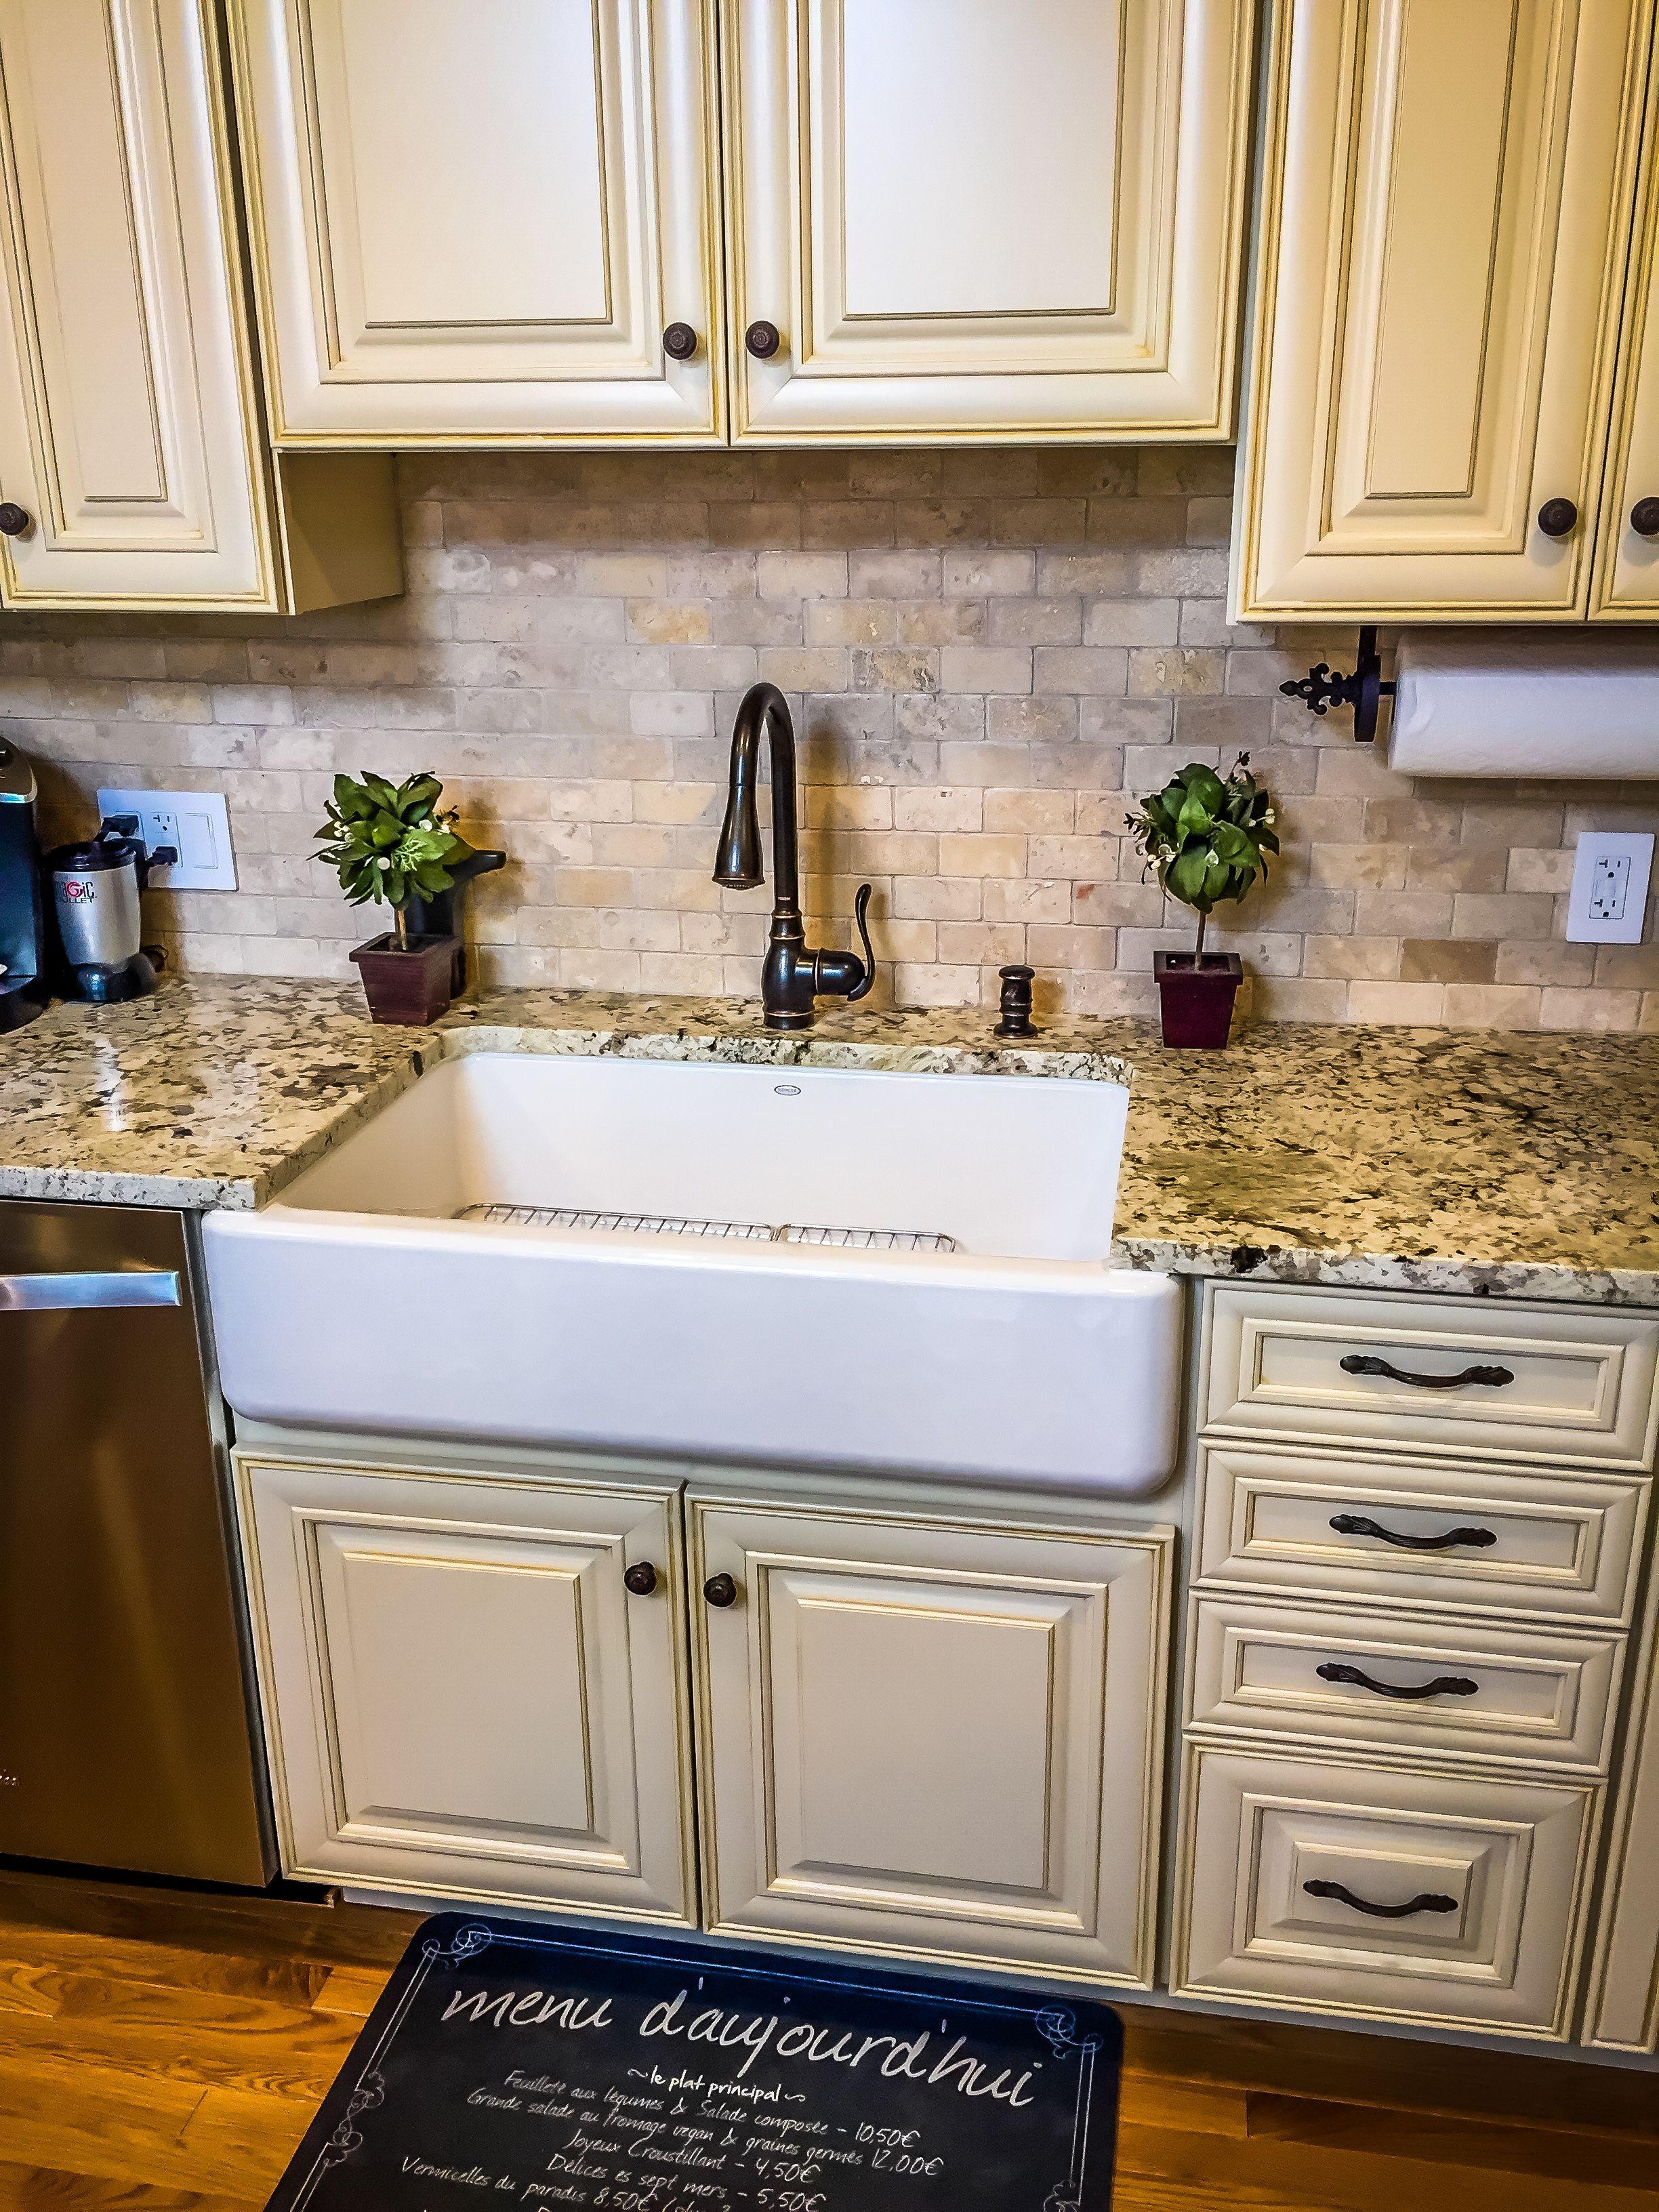 french kitchen farmhouse sink cream cabinets mini chandelier cream granite ce trendy on farmhouse kitchen hardware id=24268